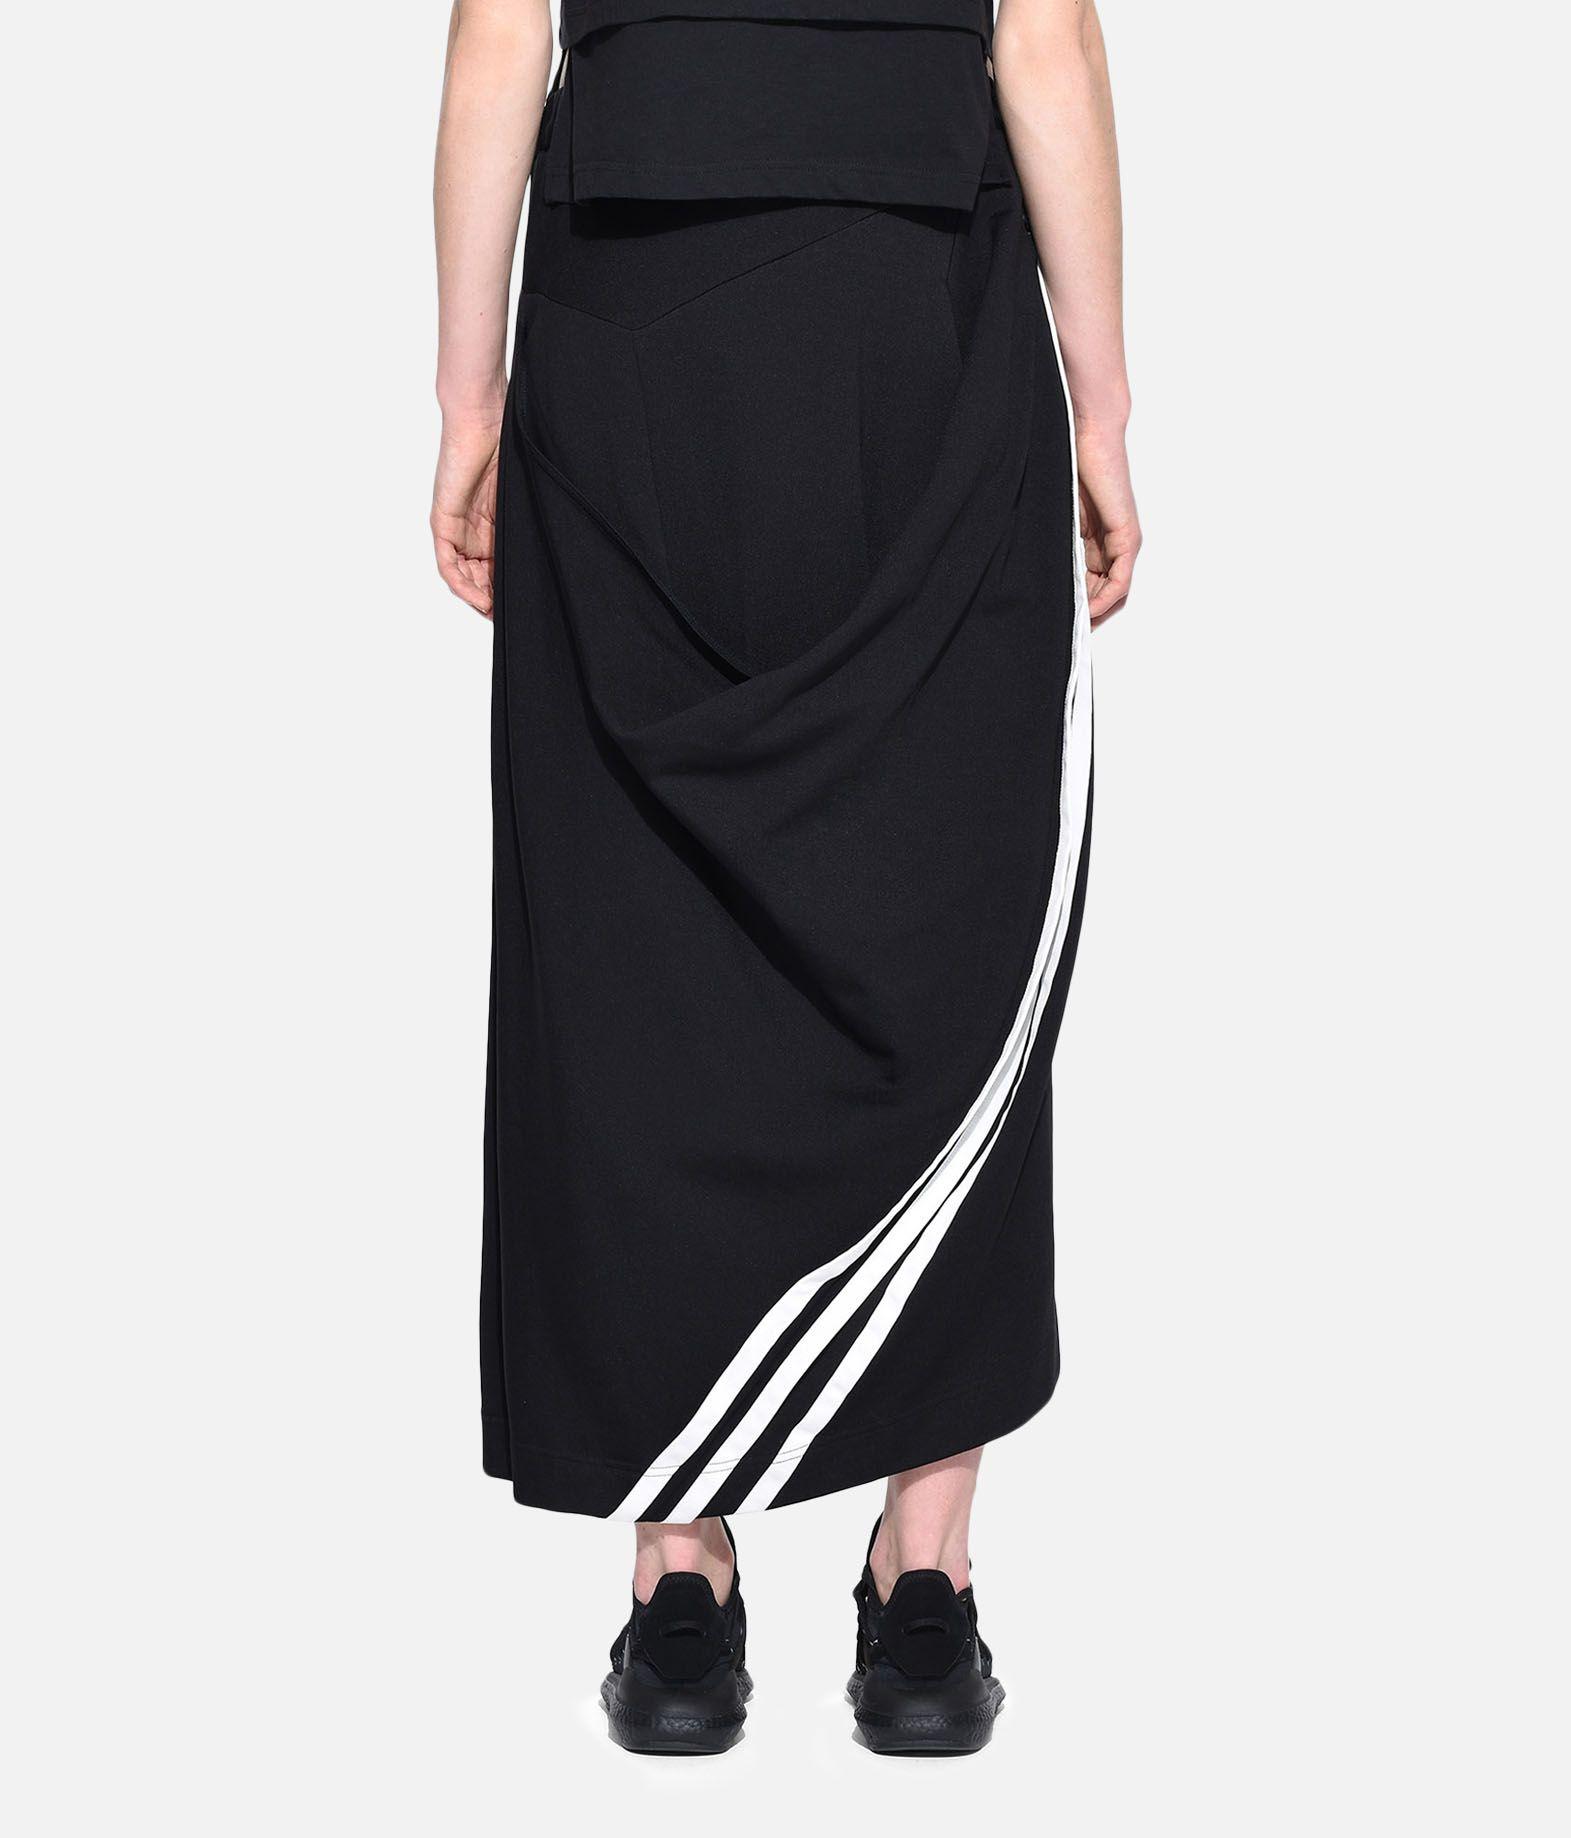 Y-3 Y-3 3-Stripes Drape Skirt Jupe au genou Femme d